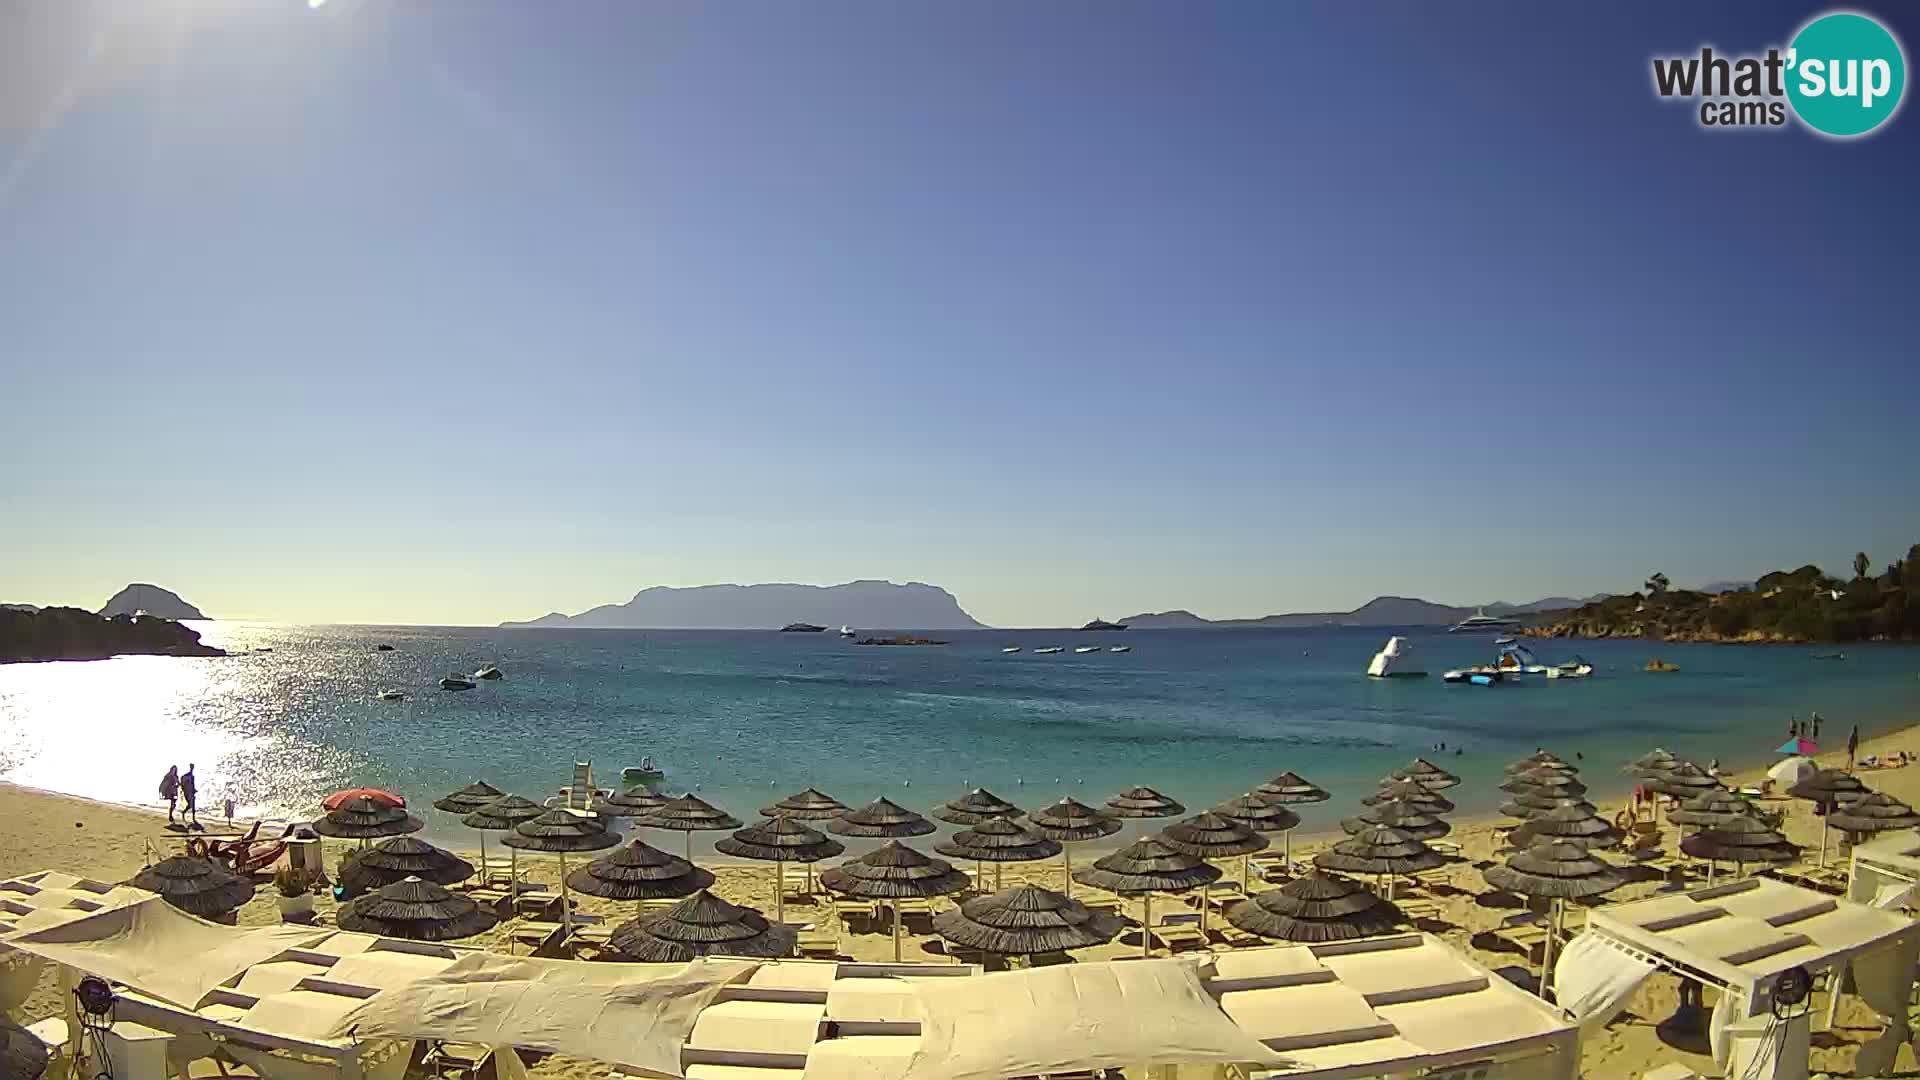 Golfo Aranci (Sardinien) Mo. 09:35